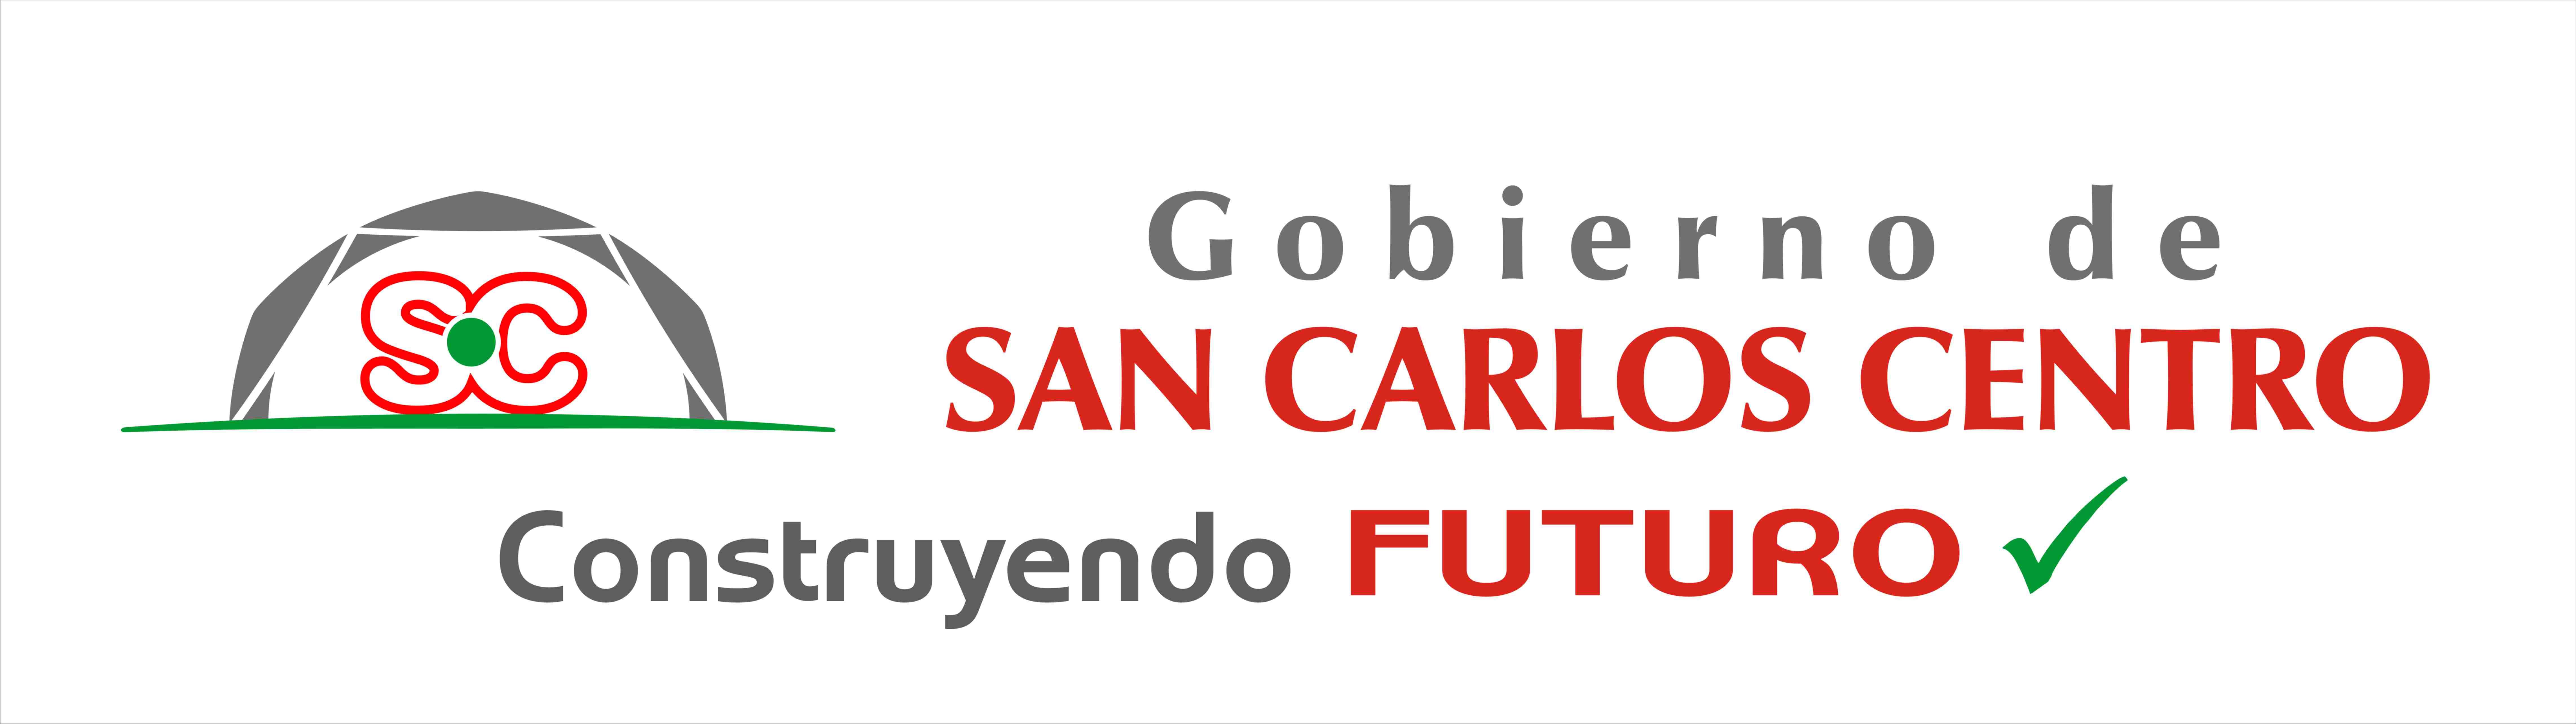 Isologo-Construyendo Futuro-2